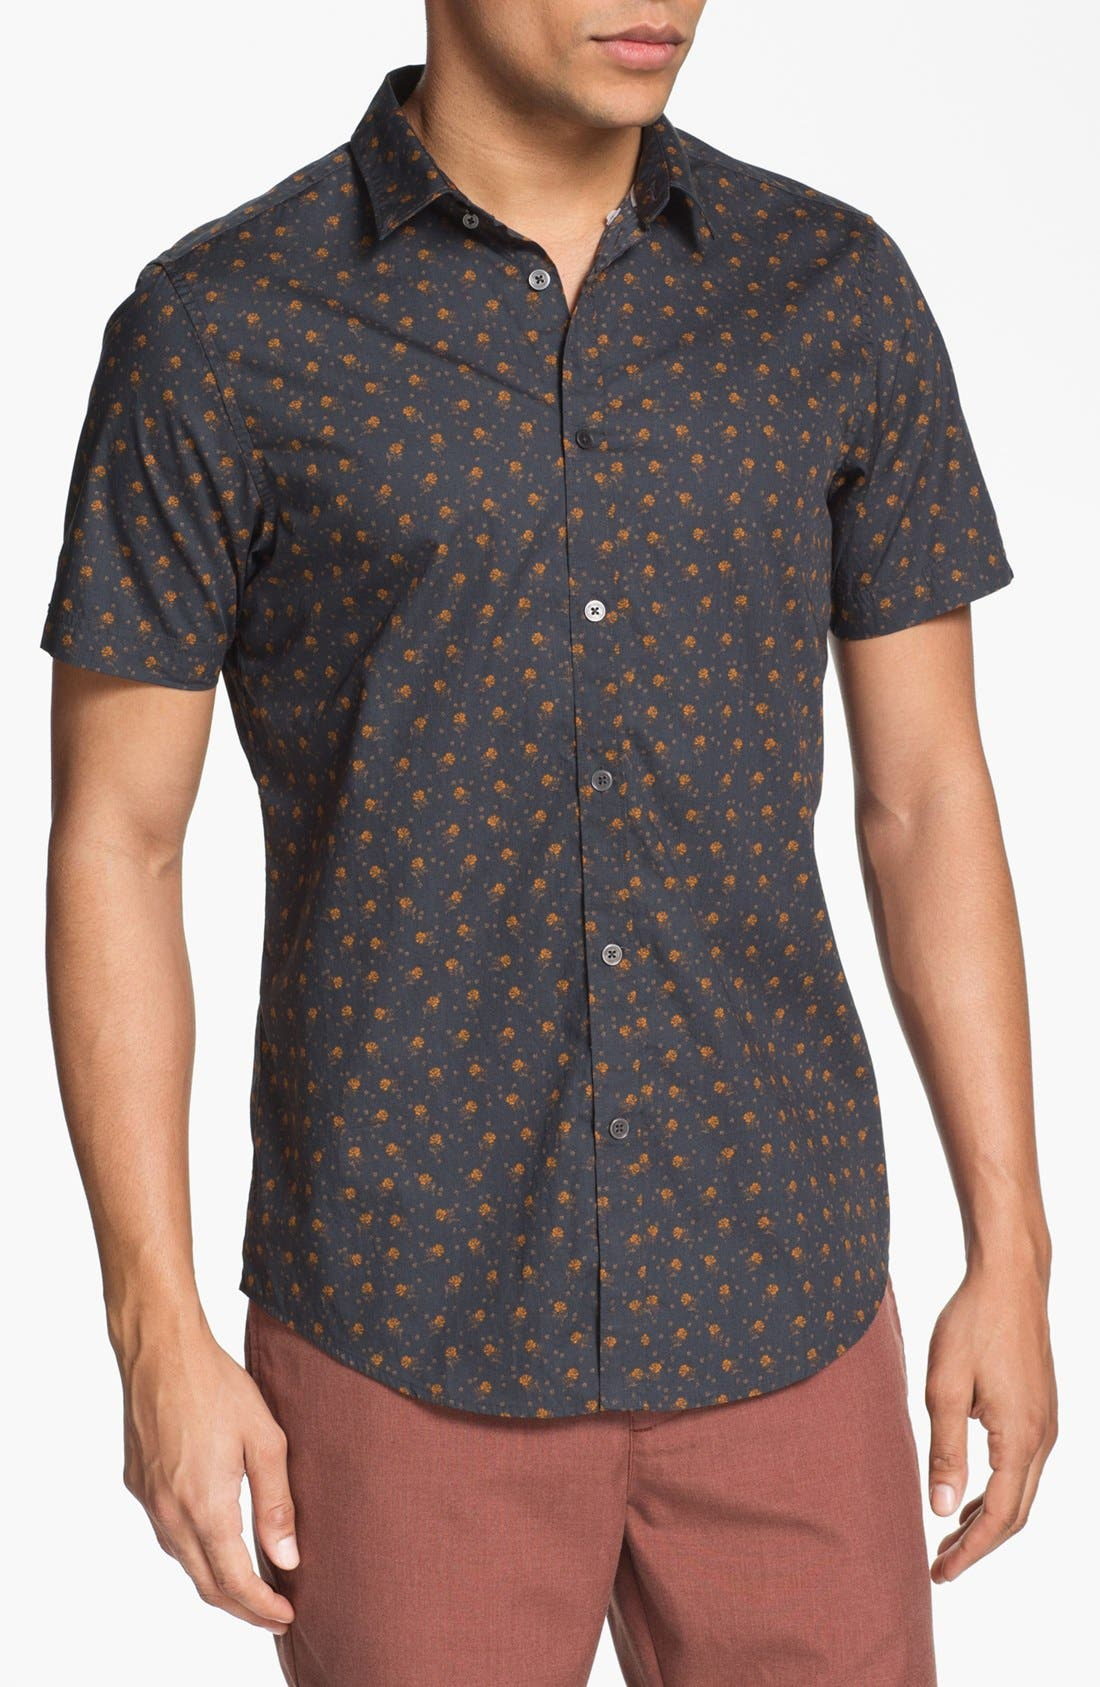 Main Image - Ben Sherman Floral Print Woven Shirt